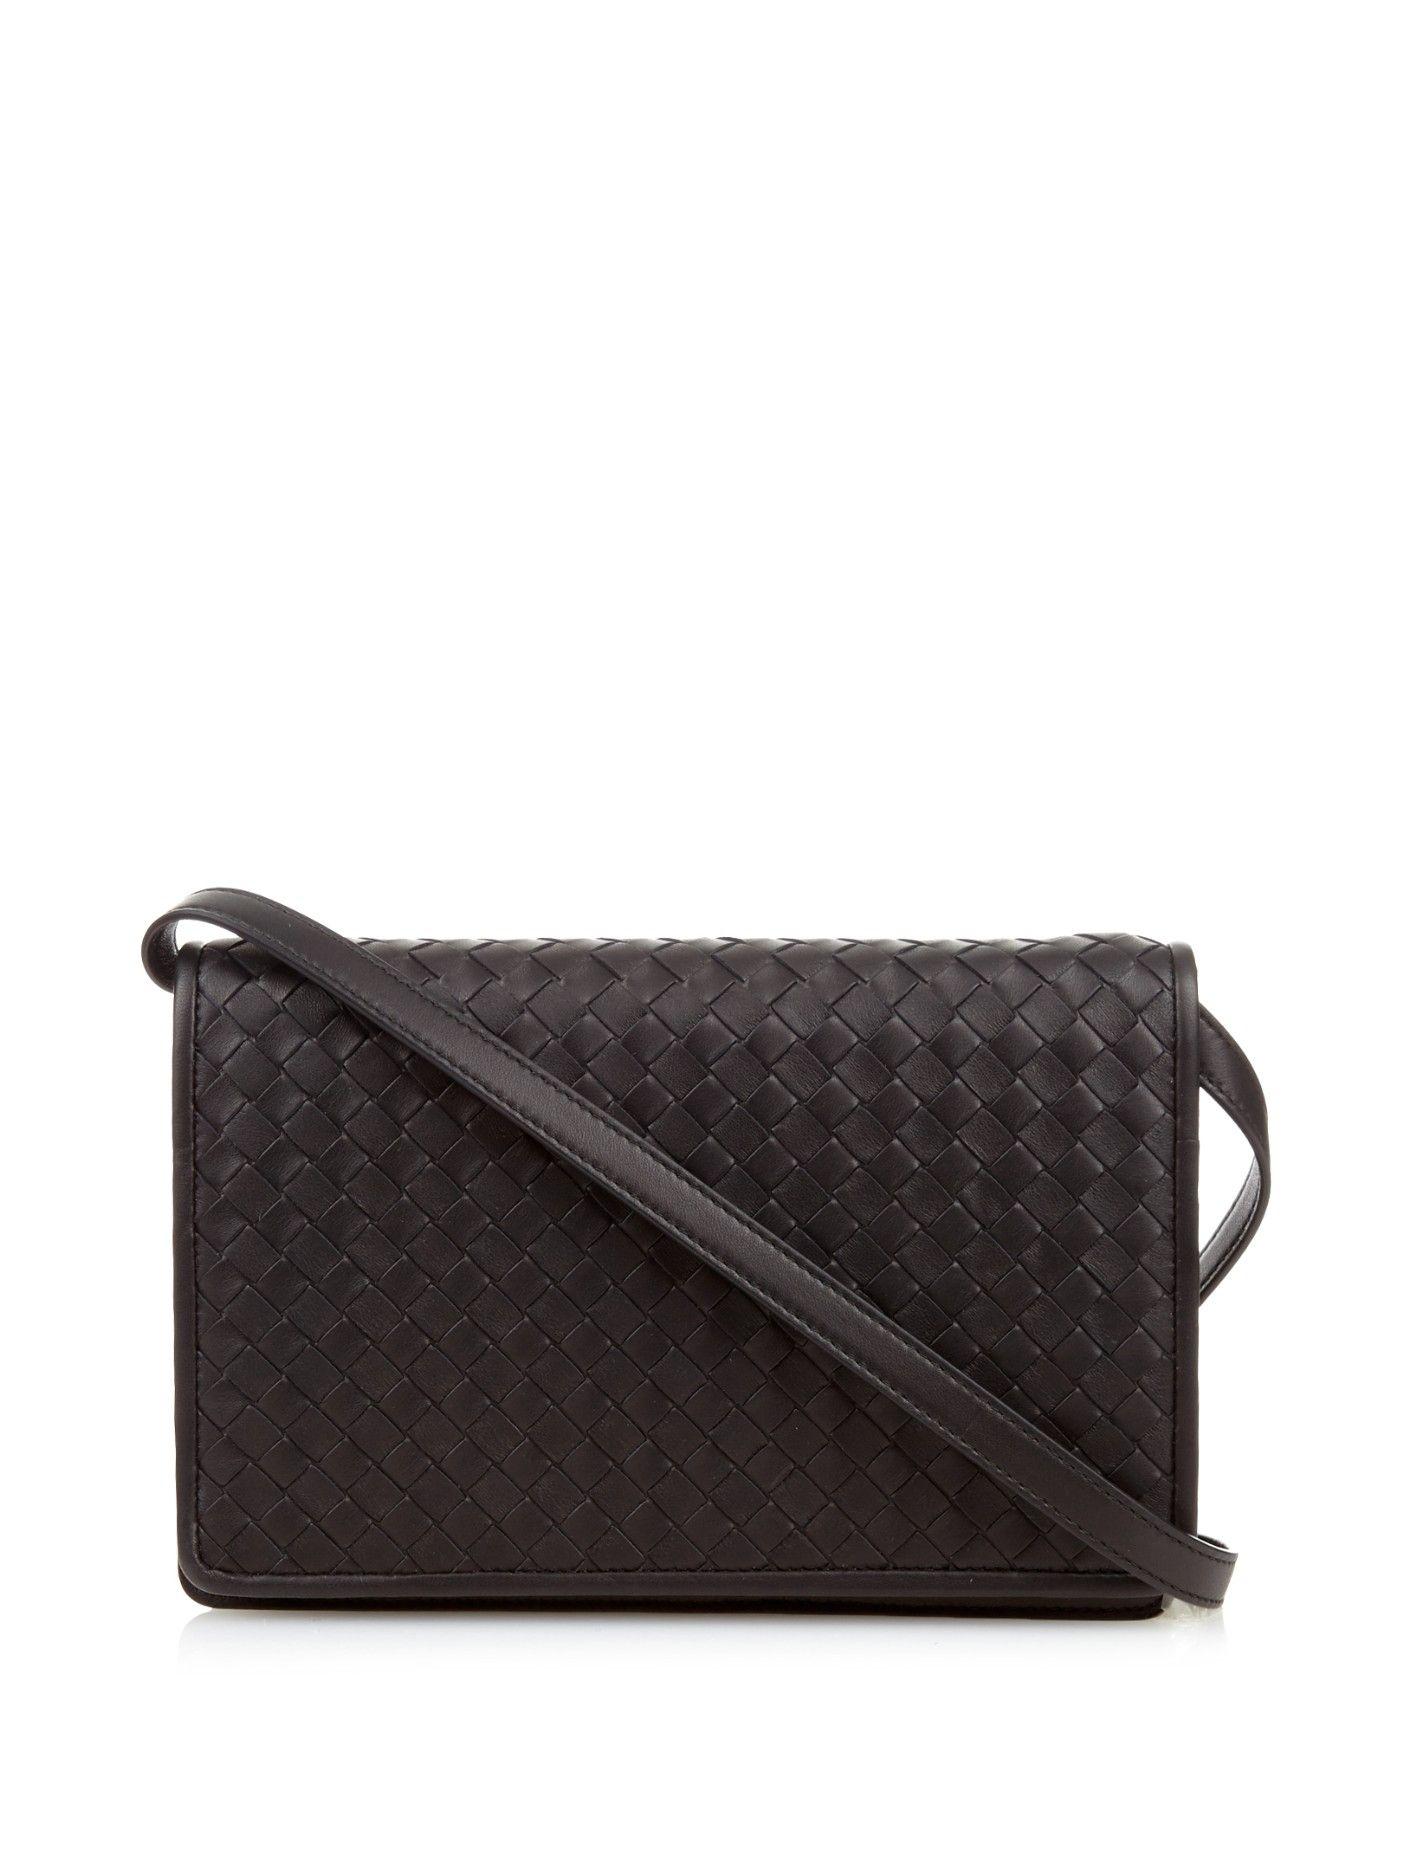 9c077a3abc Intrecciato leather fold-over clutch